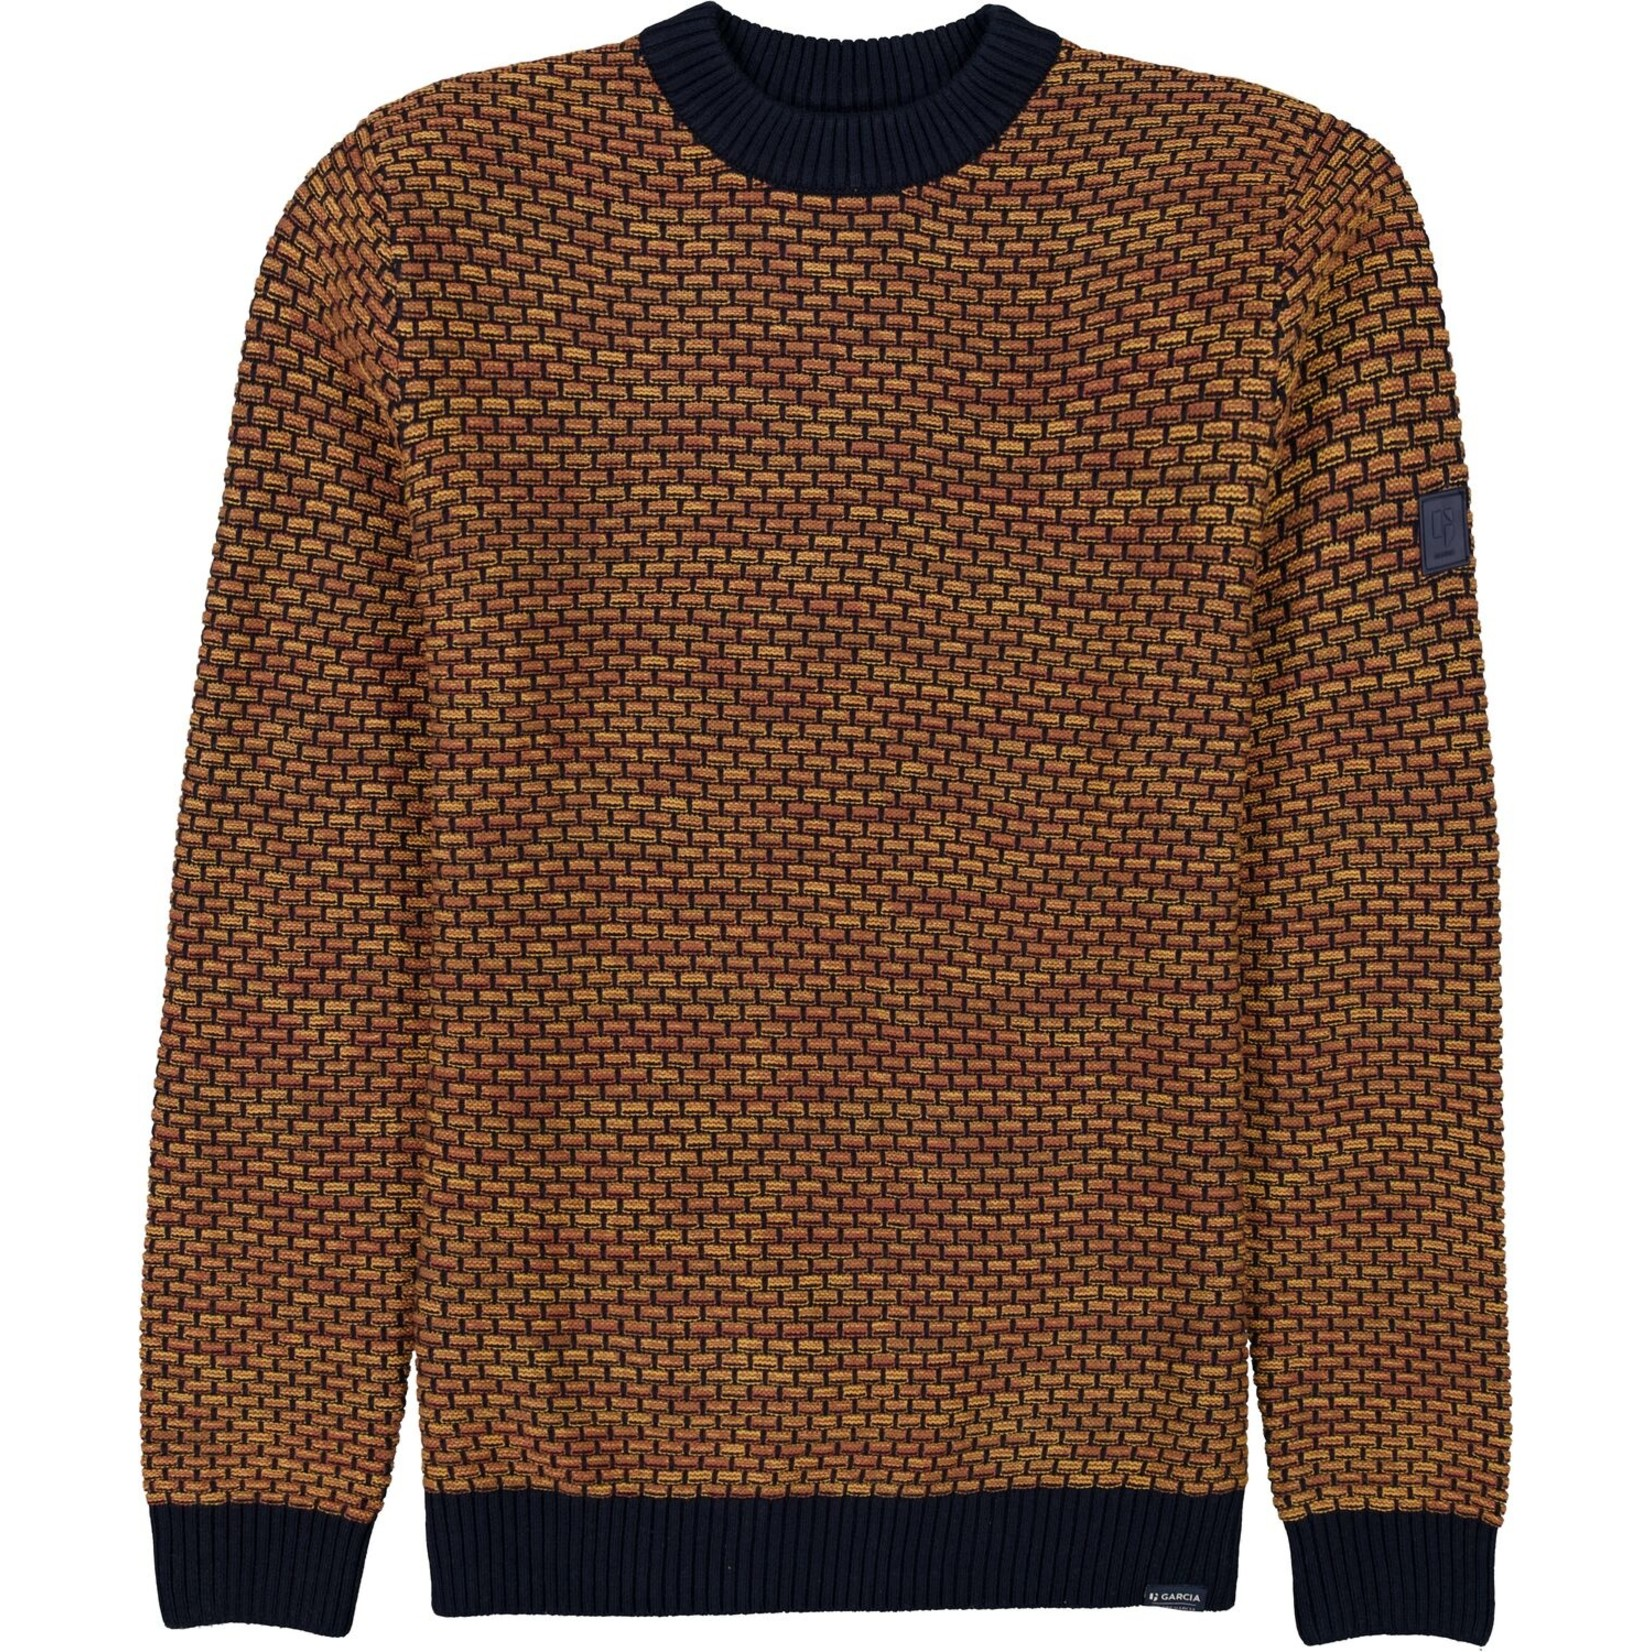 Garcia Garcia I11044 Cotton Crew Neck Sweater - 8830 Burnt Caramel